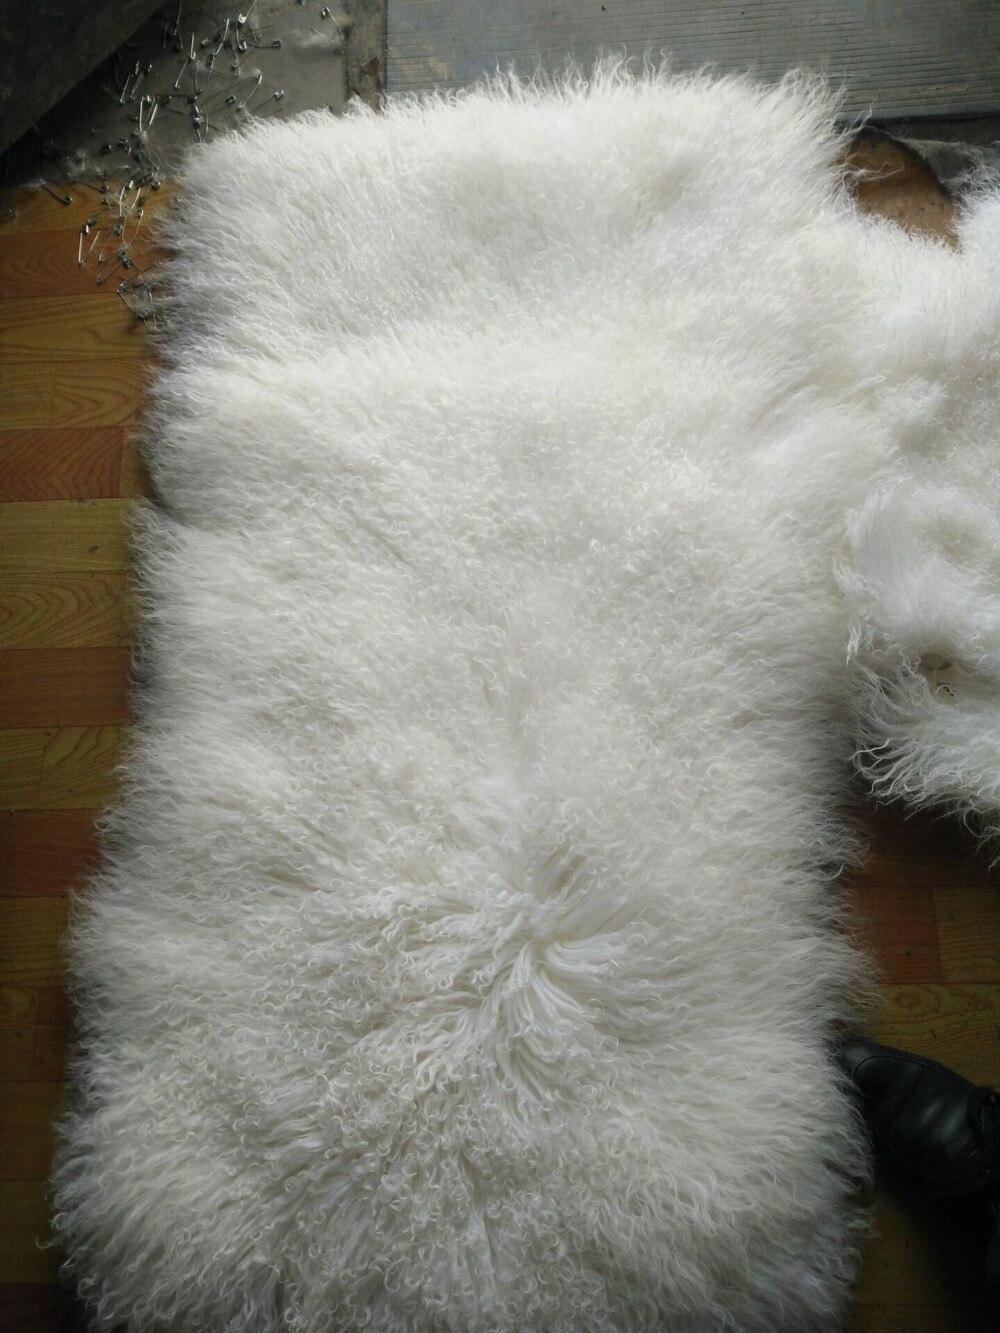 High Quality Curly Kalgan Lamb Fur Plates / Fur Plate / Sheep Fur Plate